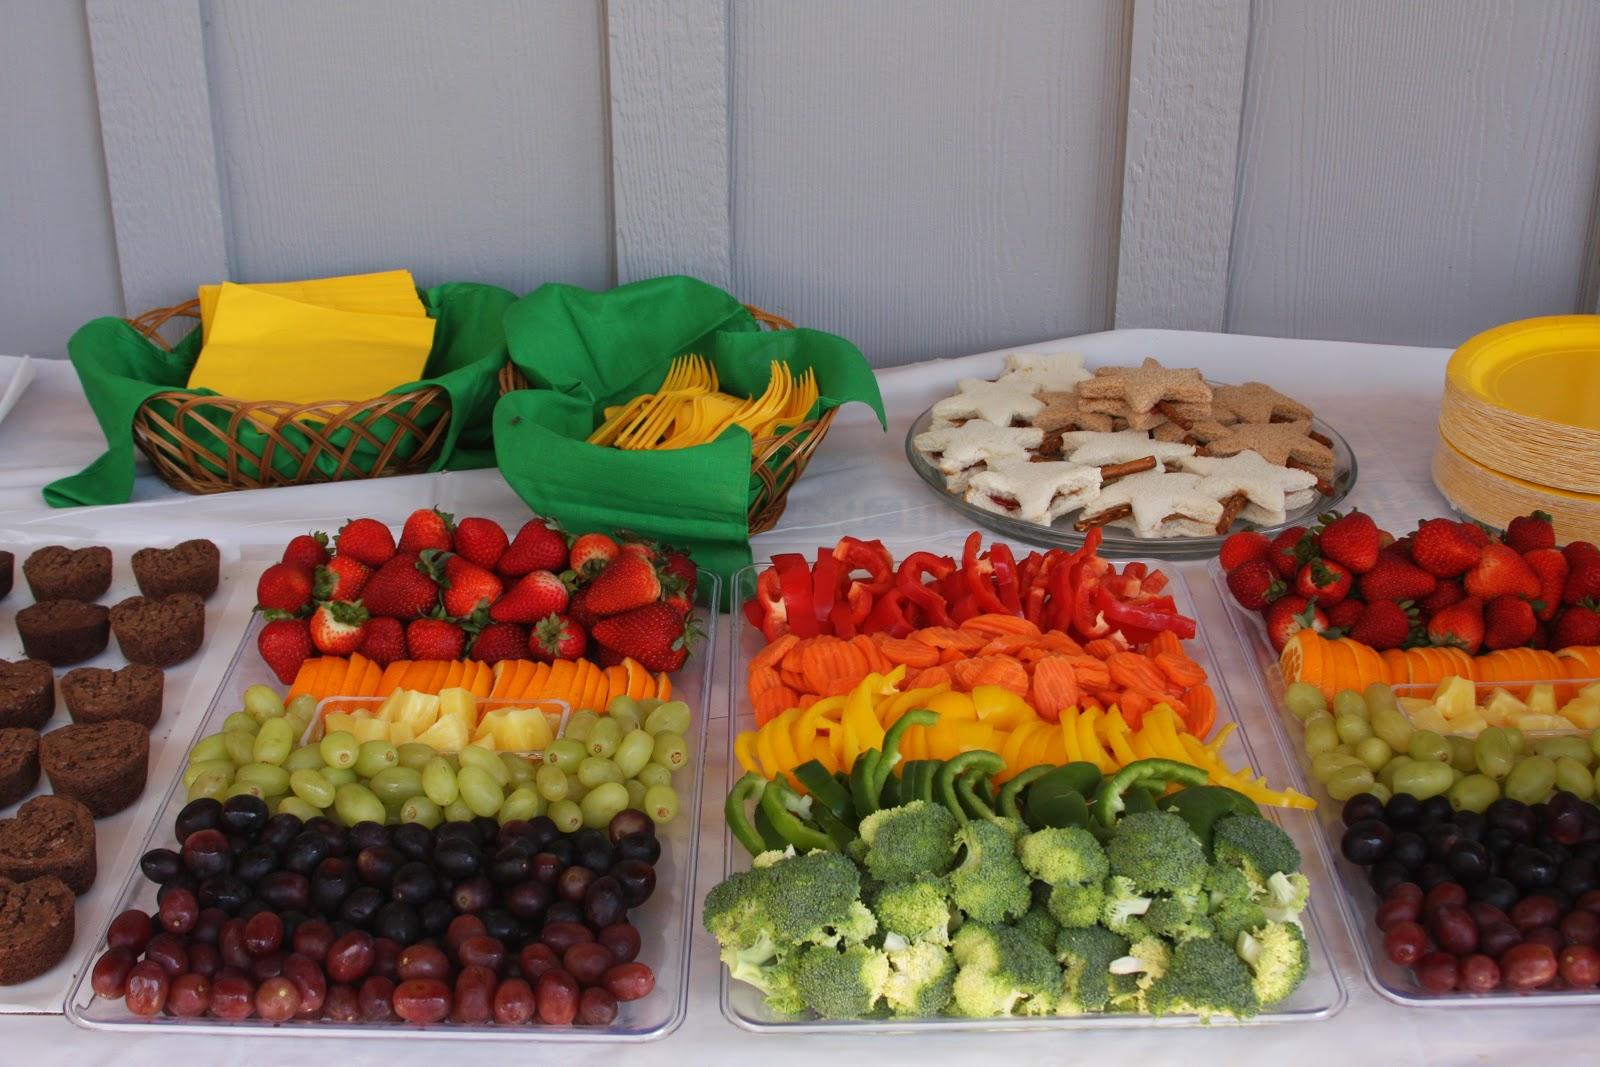 Veggie Tray Rainbow Rainbow Colored Veggies And